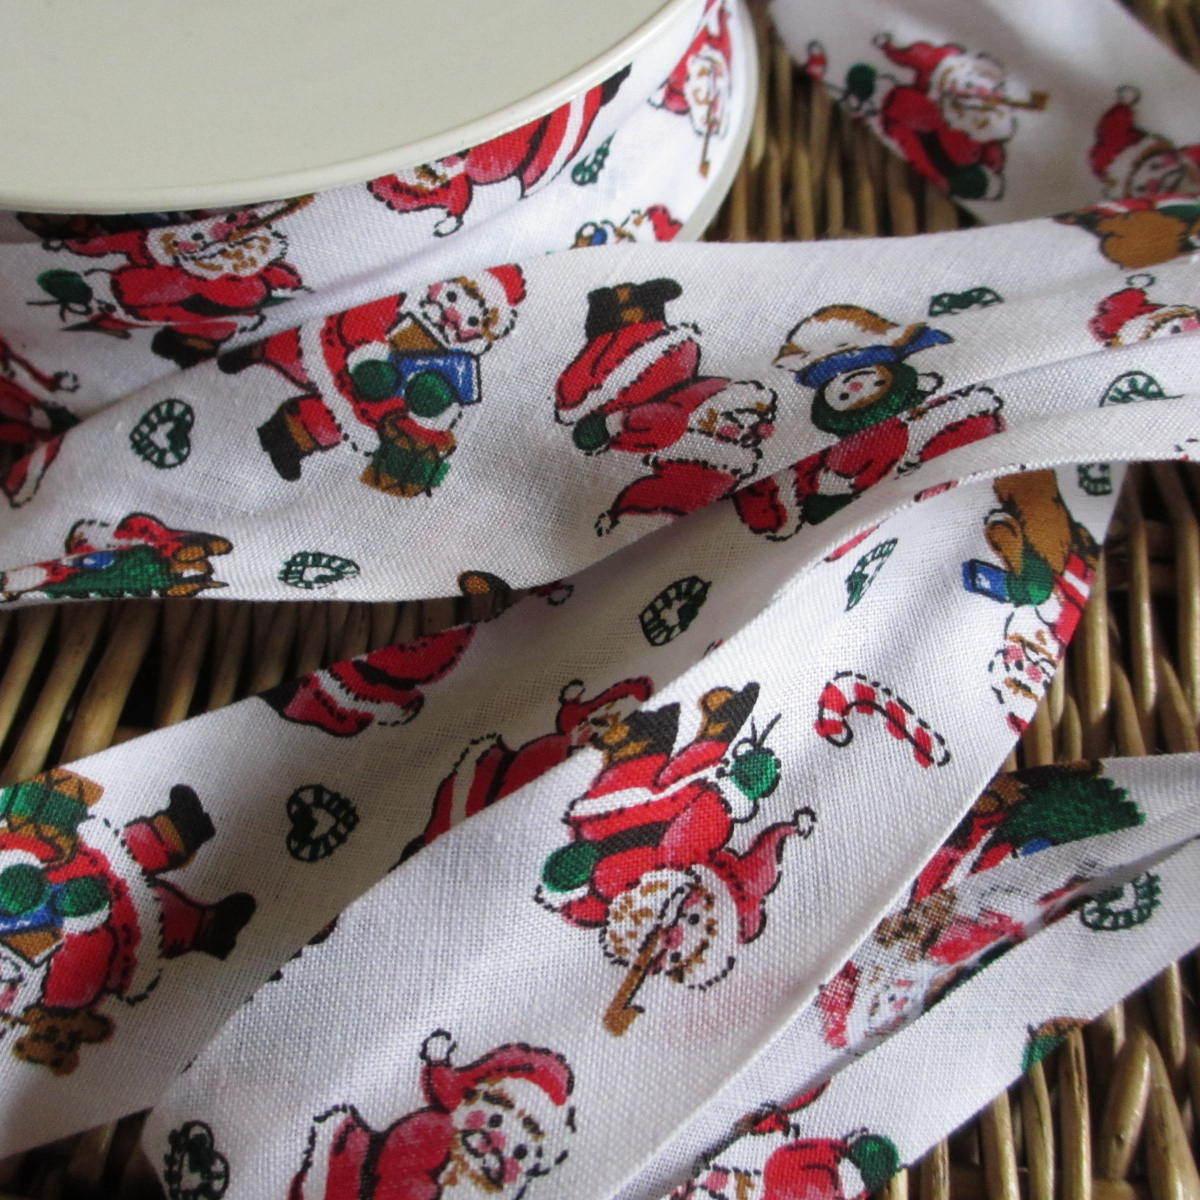 BBF25Cherry-M per 3 metres Cherry Print Cotton Bias Binding Tape LL